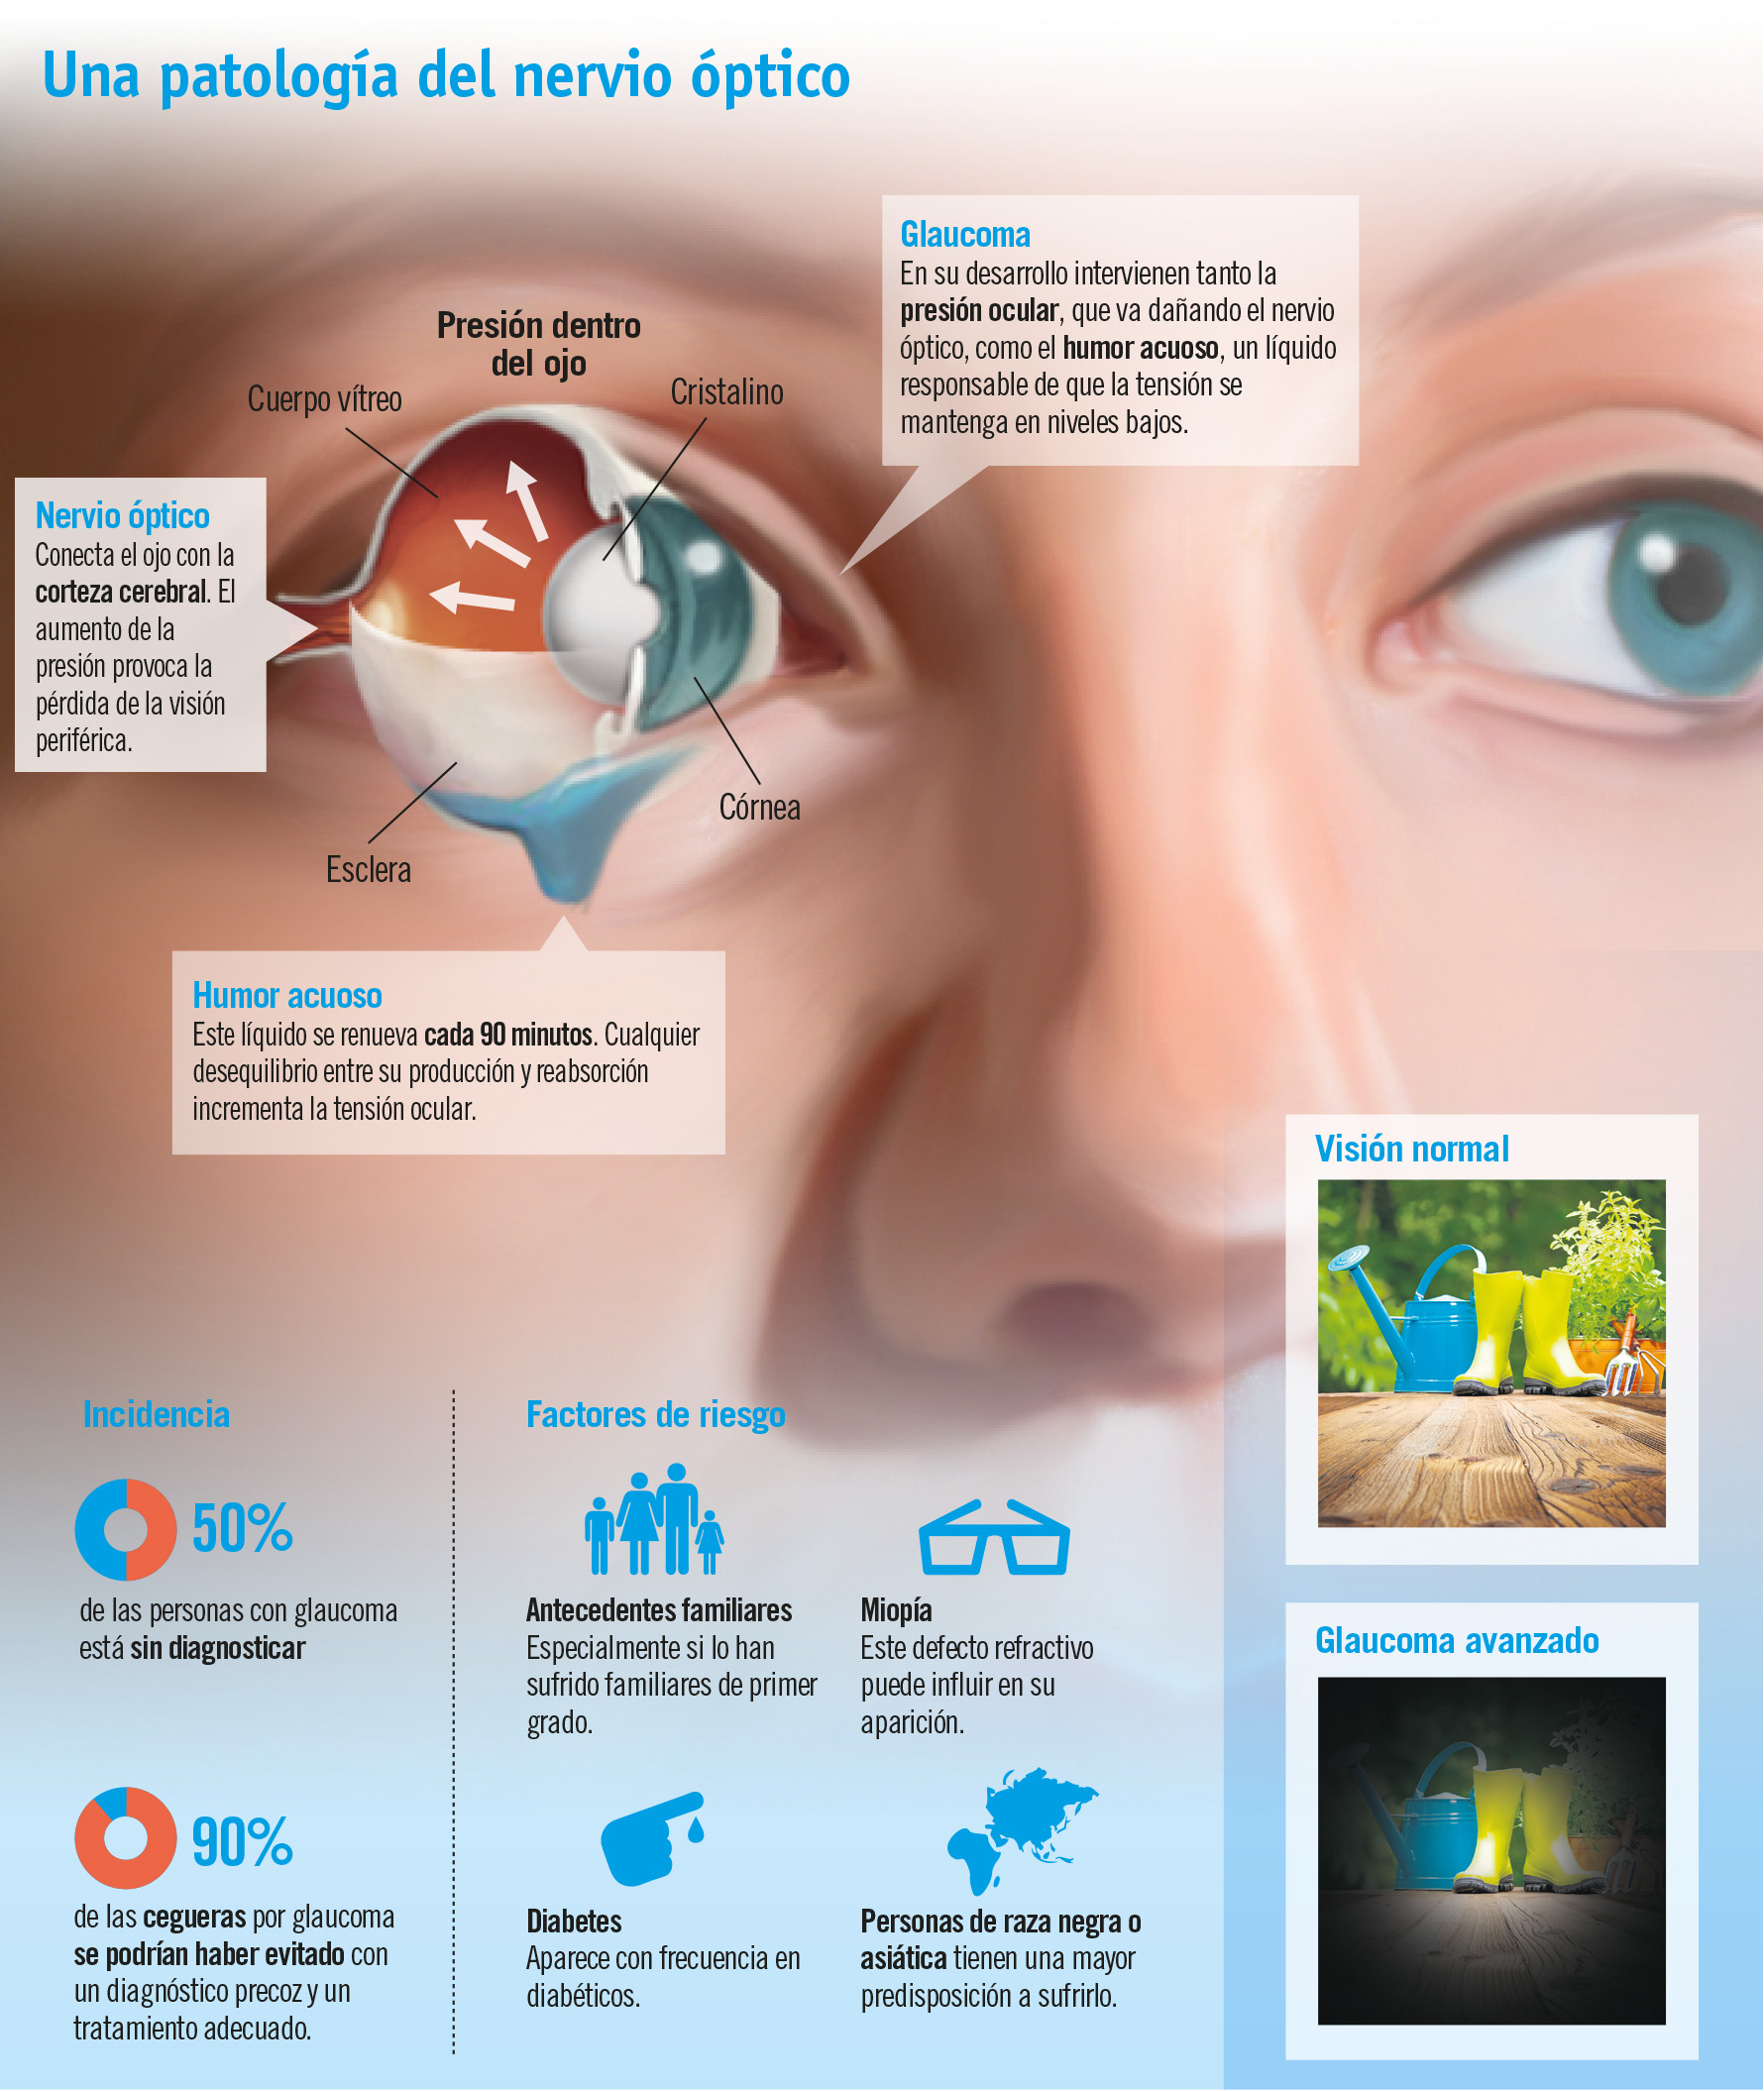 Glaucoma, cómo prevenir la 'ceguera silenciosa'